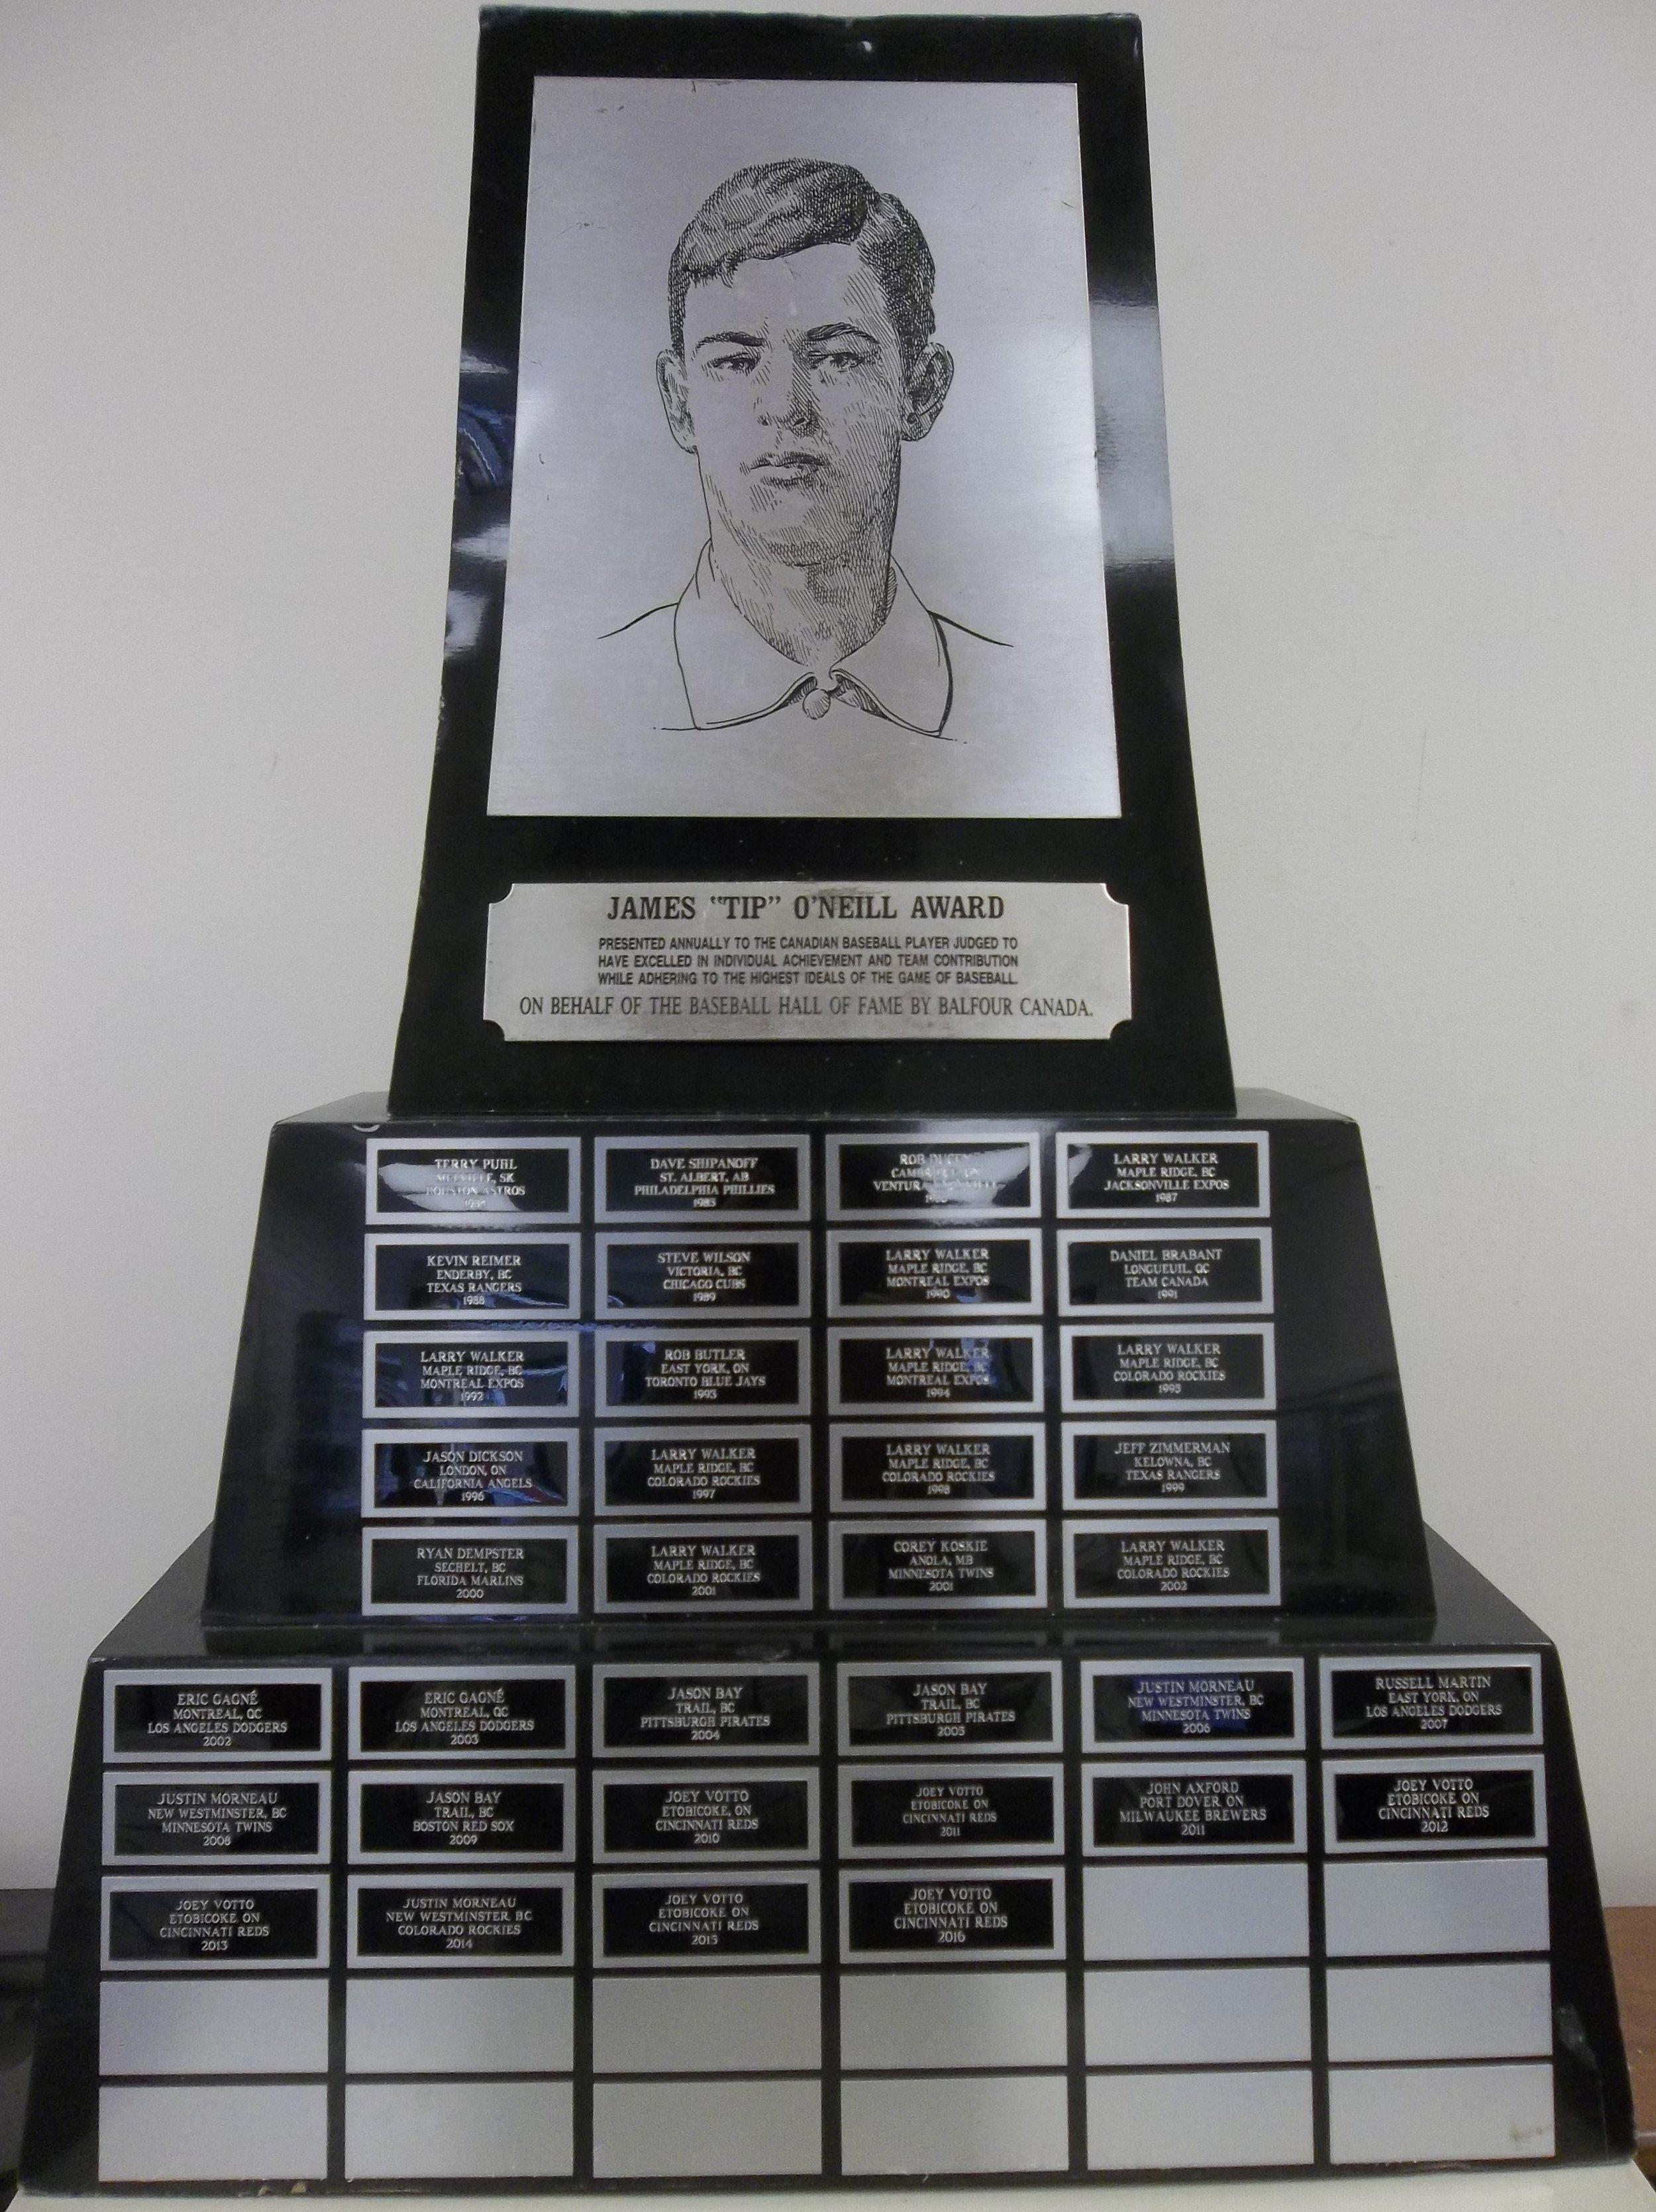 The Canadian Baseball Hall of Fame's Tip O'Neill Award trophy. Photo: Canadian Baseball Hall of Fame